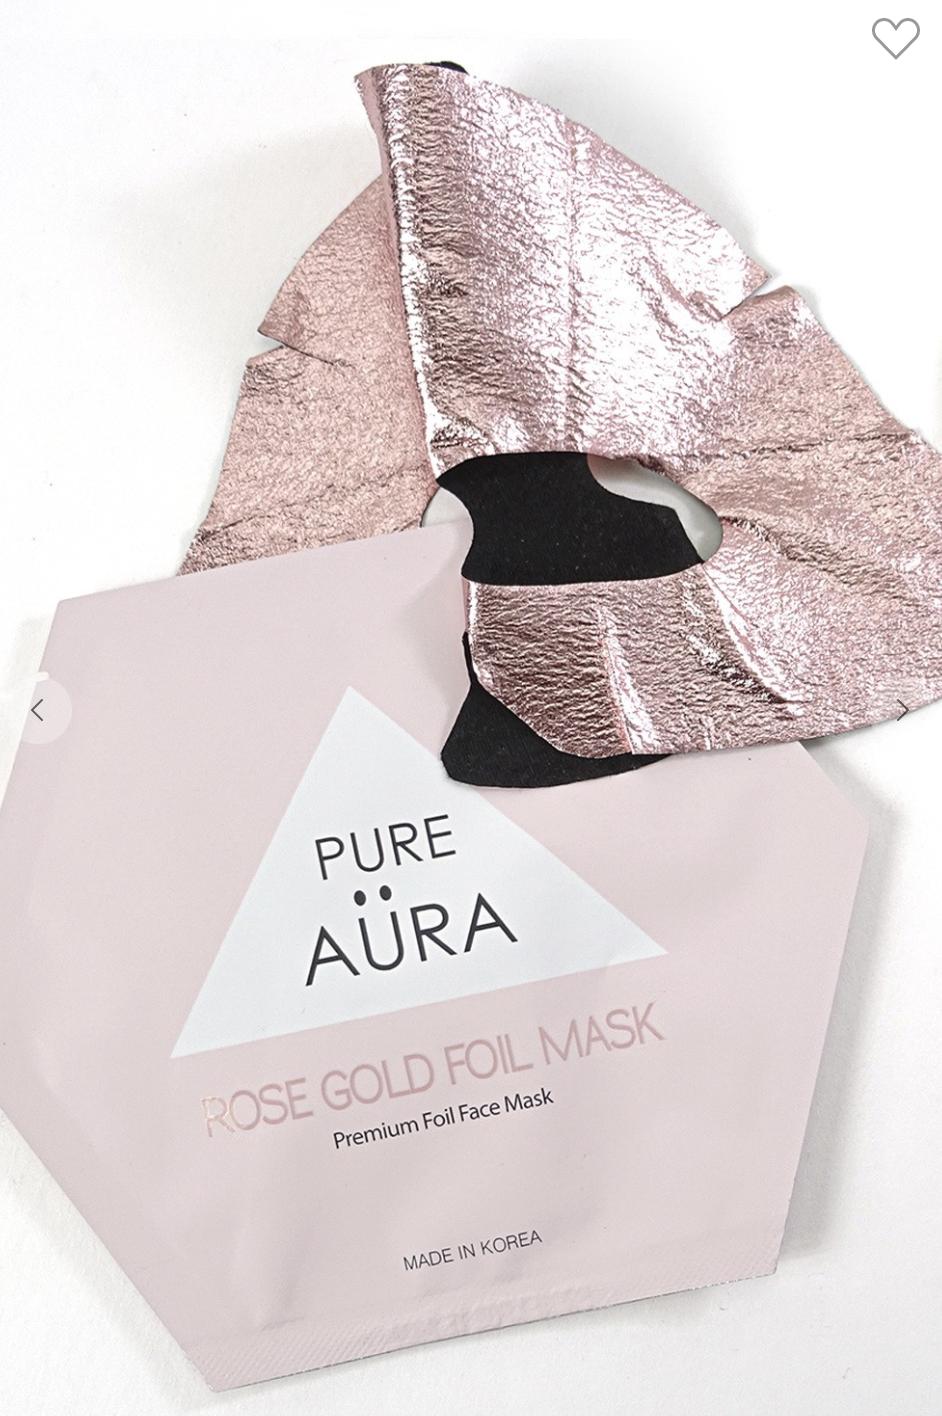 Rose Gold Metallic Foil Mask